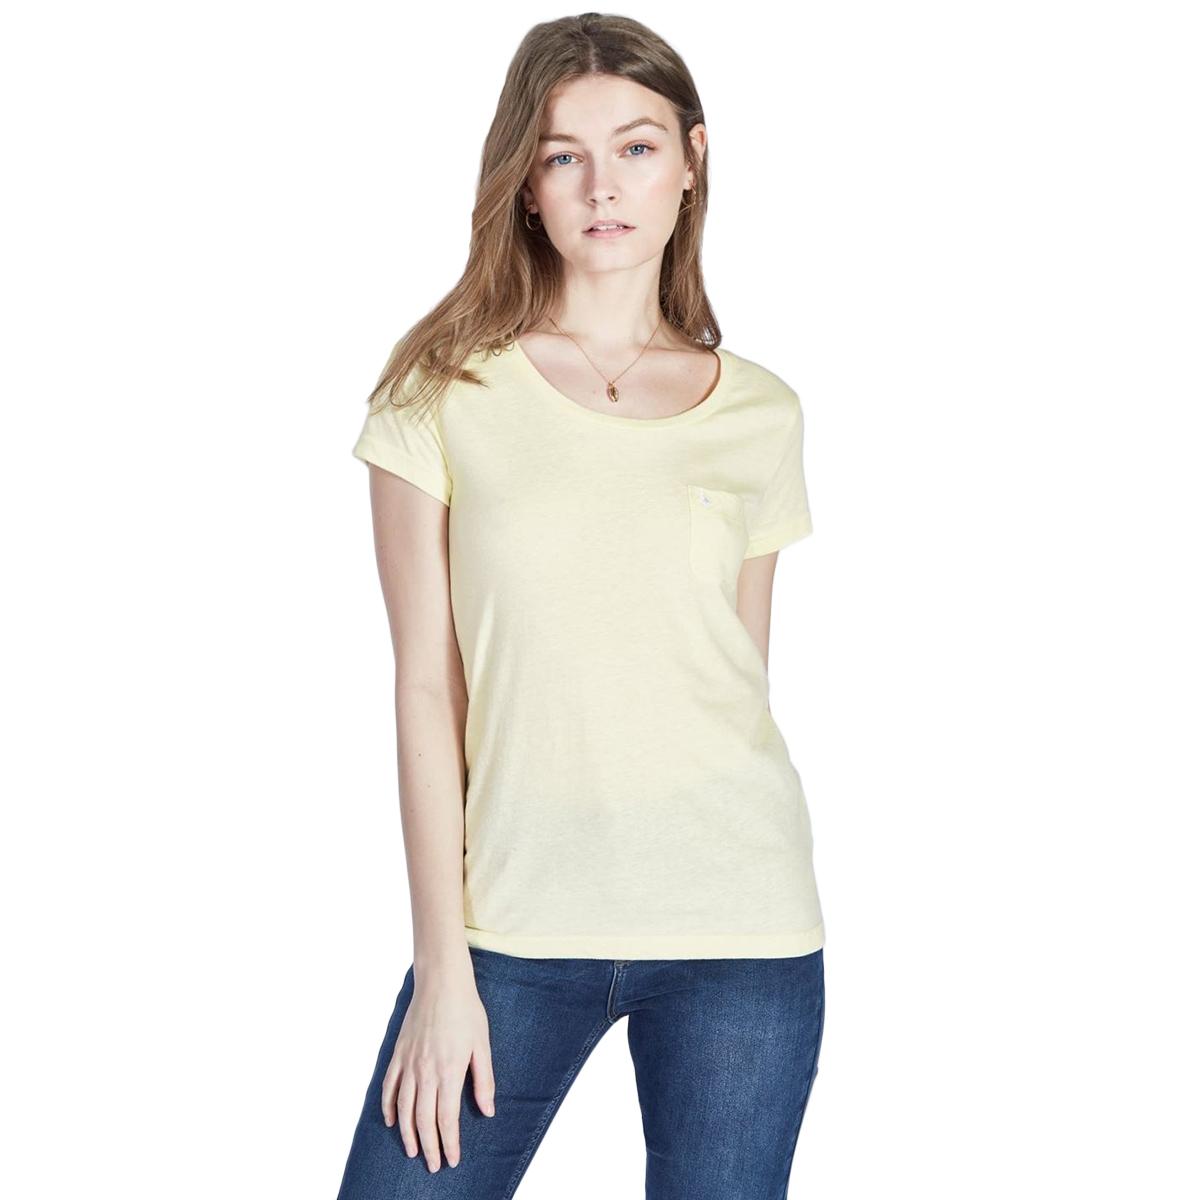 Jack Wills Women's Fullford Short-Sleeve Tee - Yellow, 8